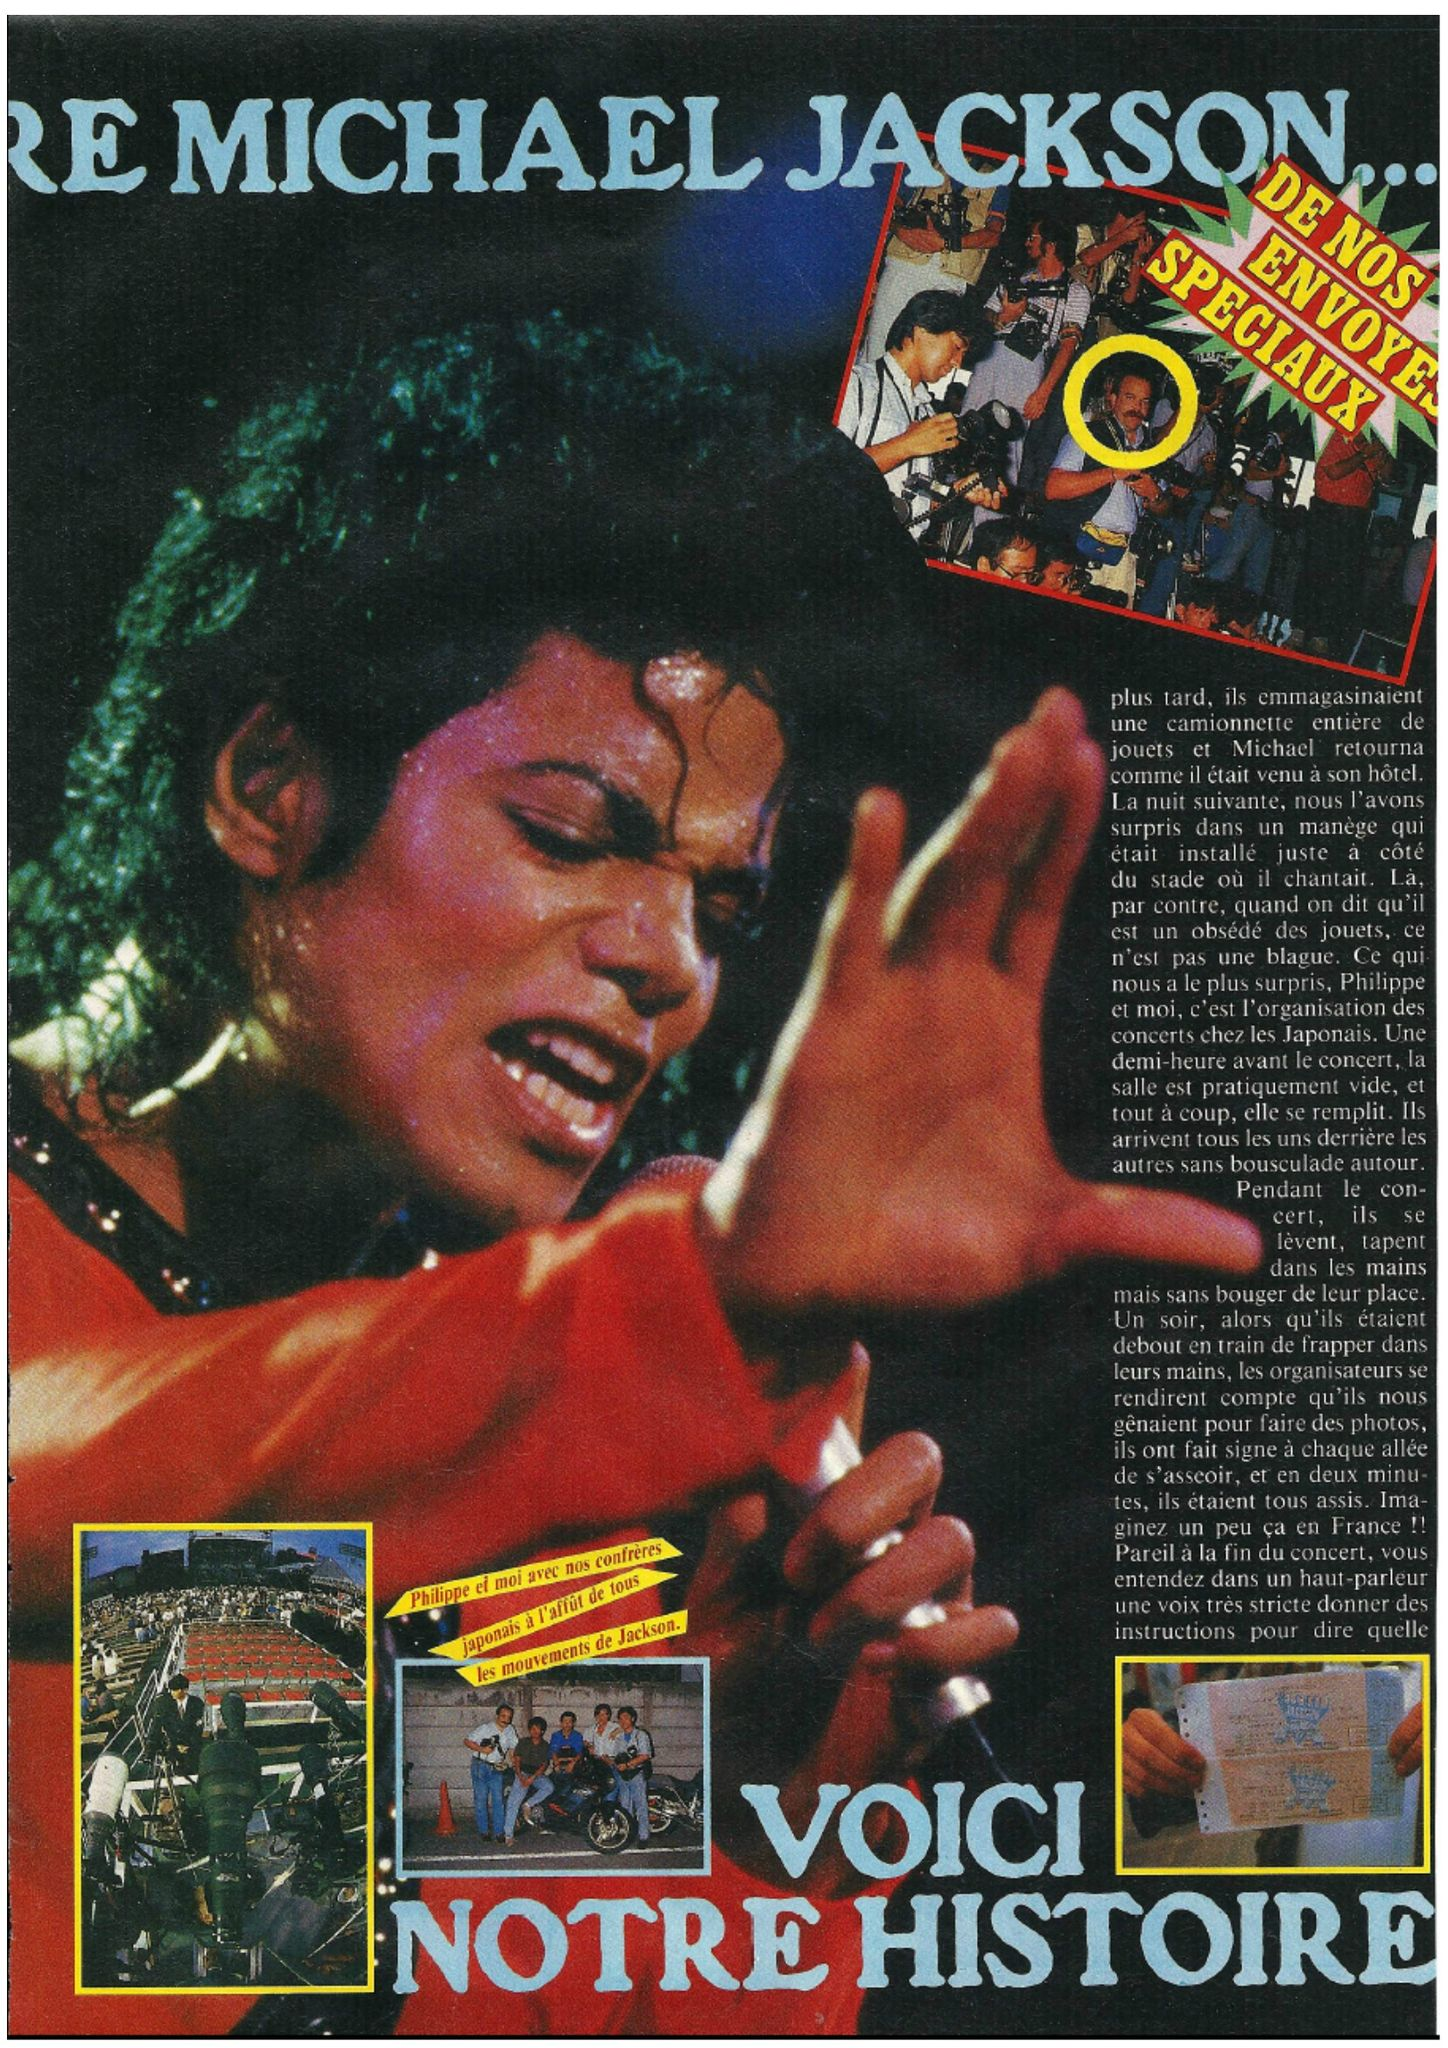 Bad Era Nous Avons Rencontr Michael Jackson Podium